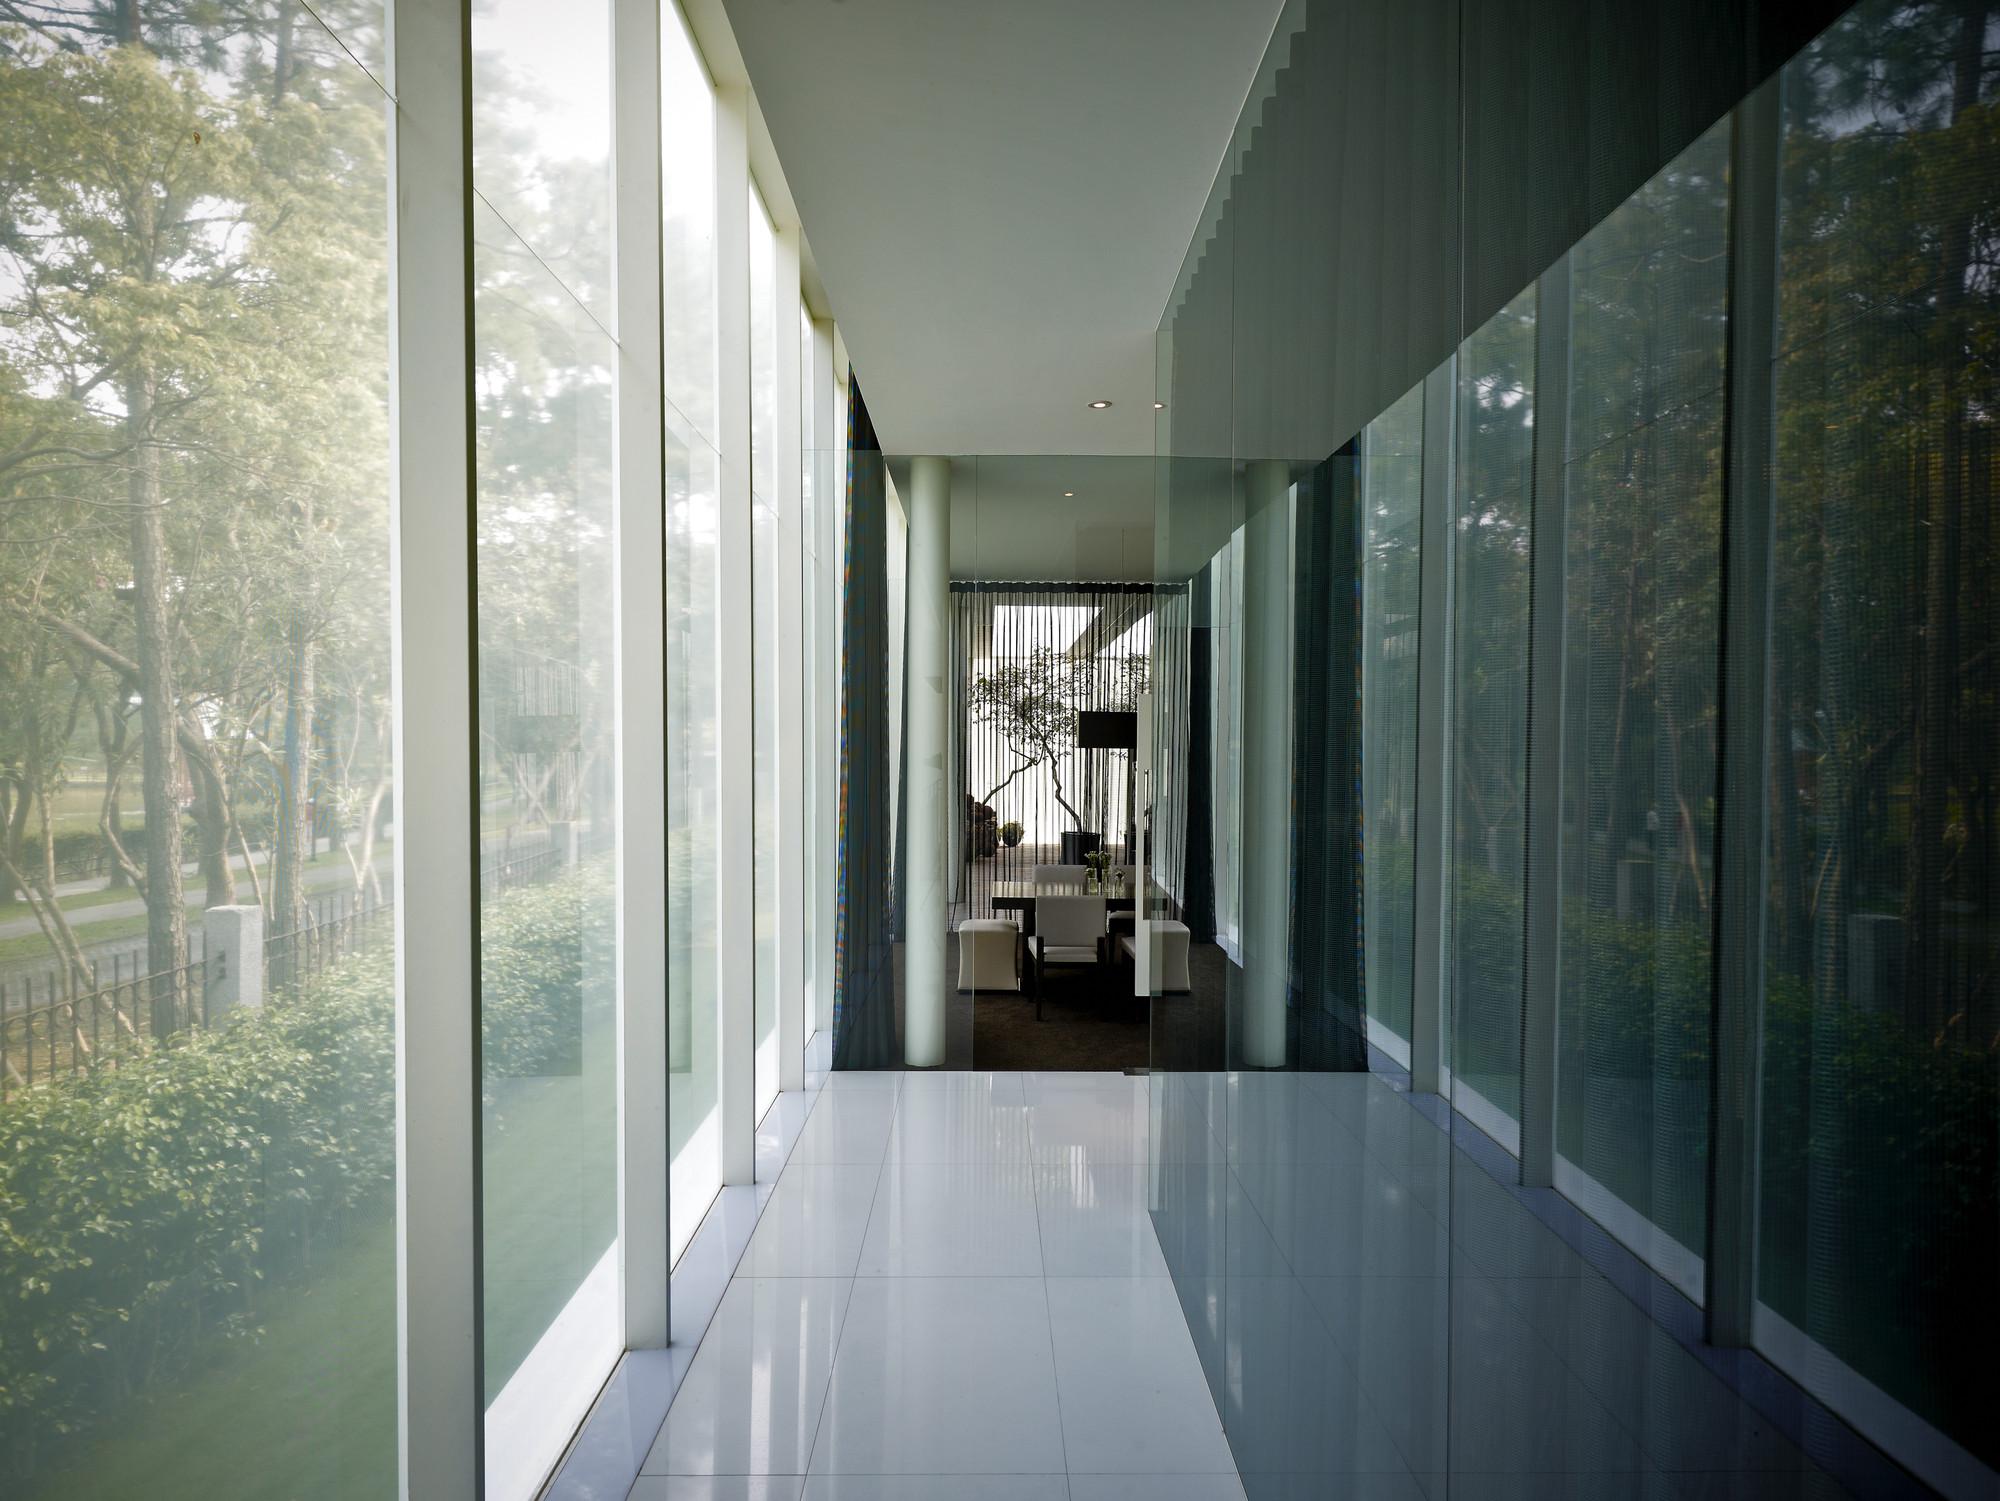 Galeria de lightbox hsuyuan kuo architect associates 24 for Architect associates